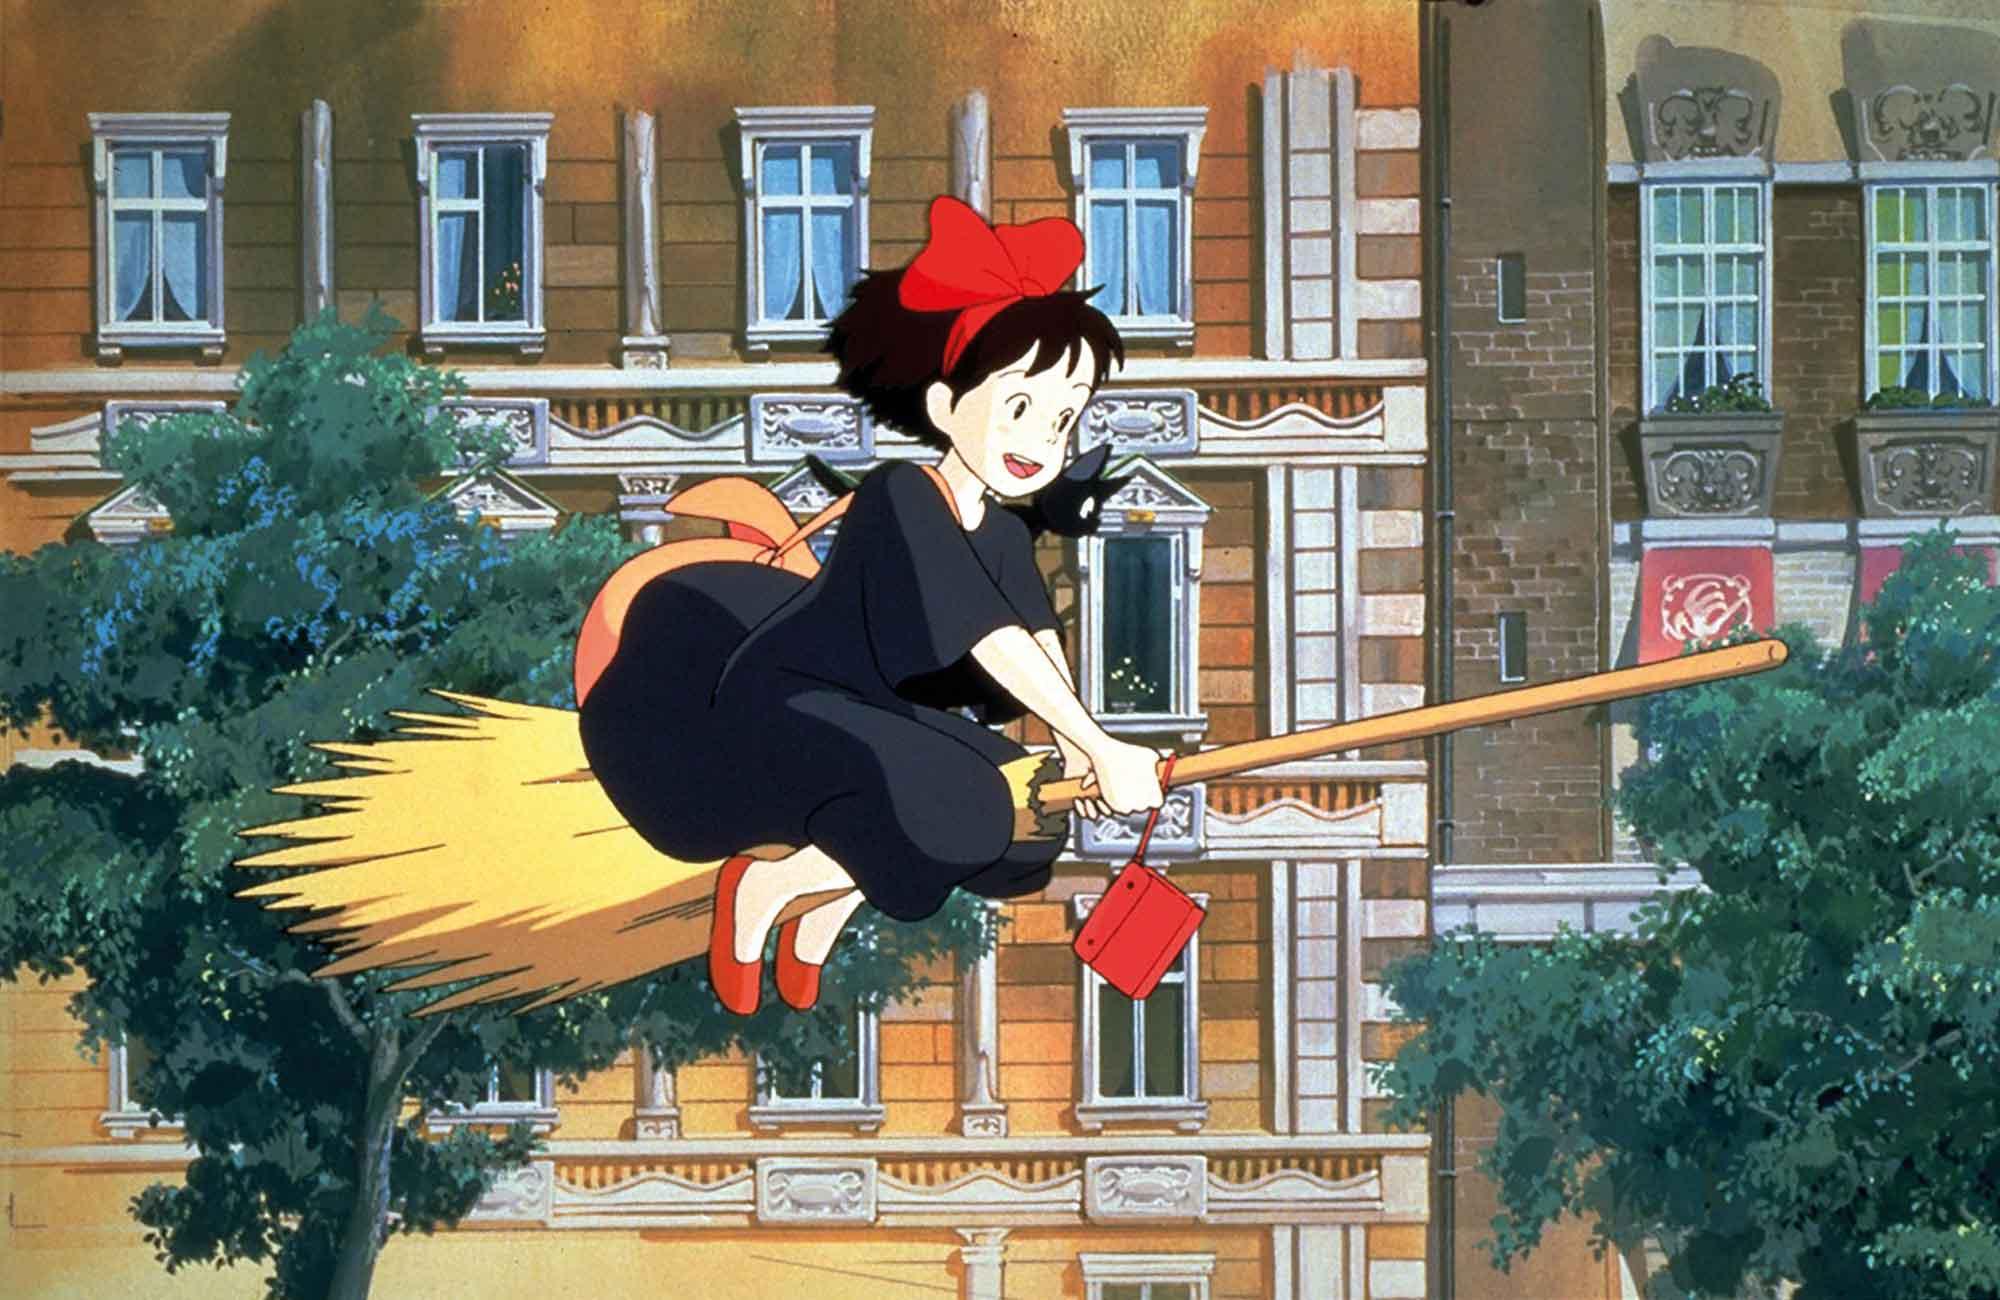 kiki stockholm miyazaki ghibli lieu réel Amplitudes